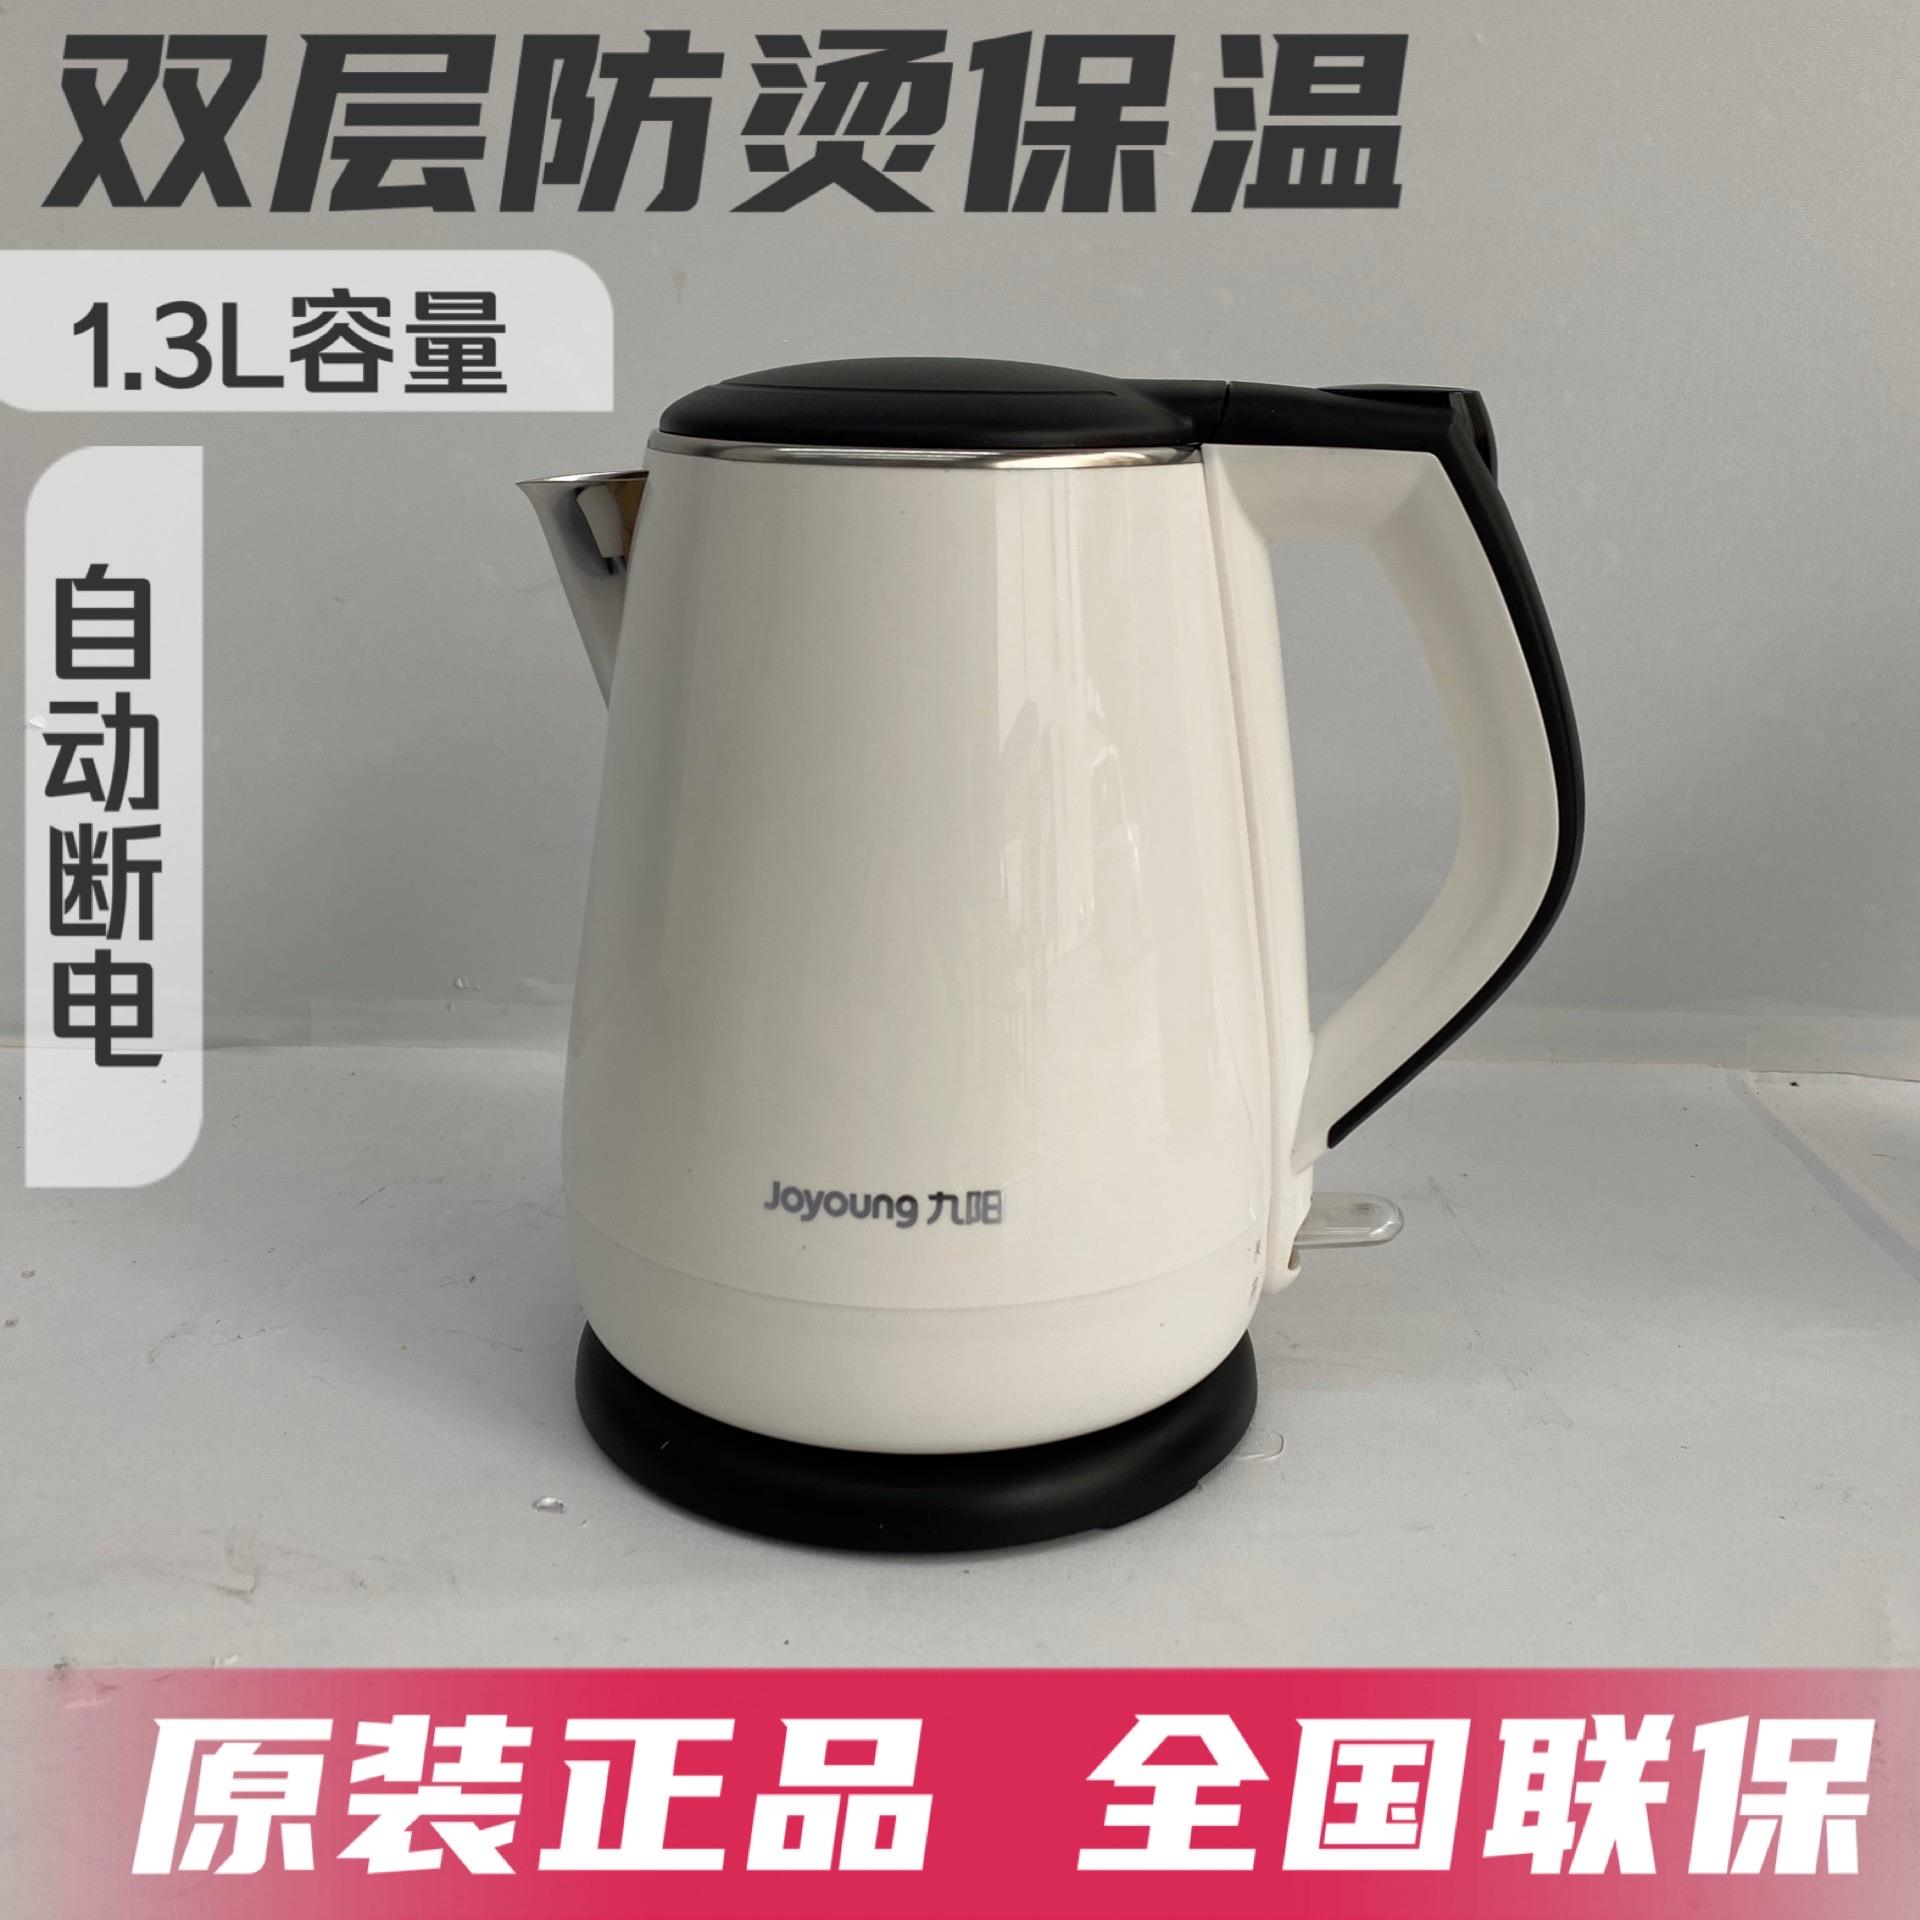 Joyoung/九阳 JYK-13F05A电热水壶304不锈钢烧水壶1.3L